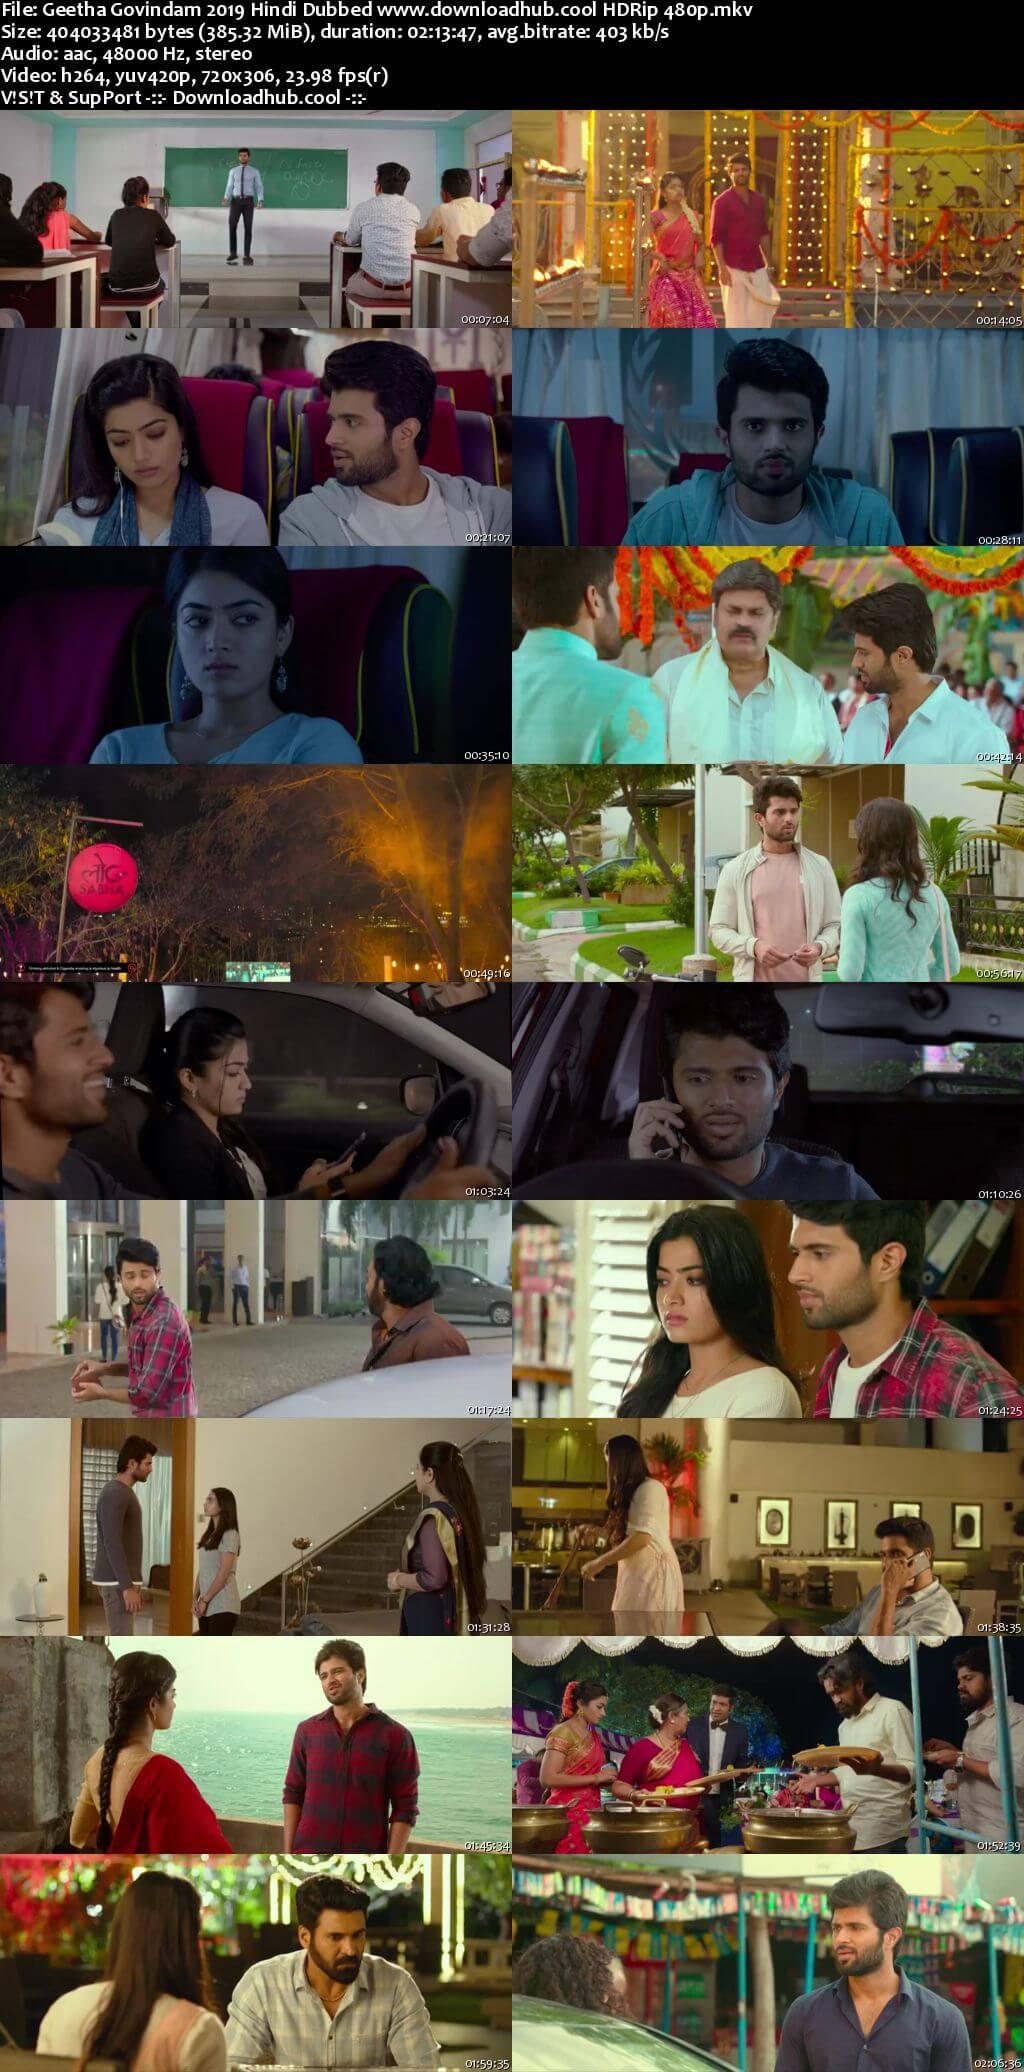 Geetha Govindam 2019 Hindi Dubbed 350MB HDRip 480p